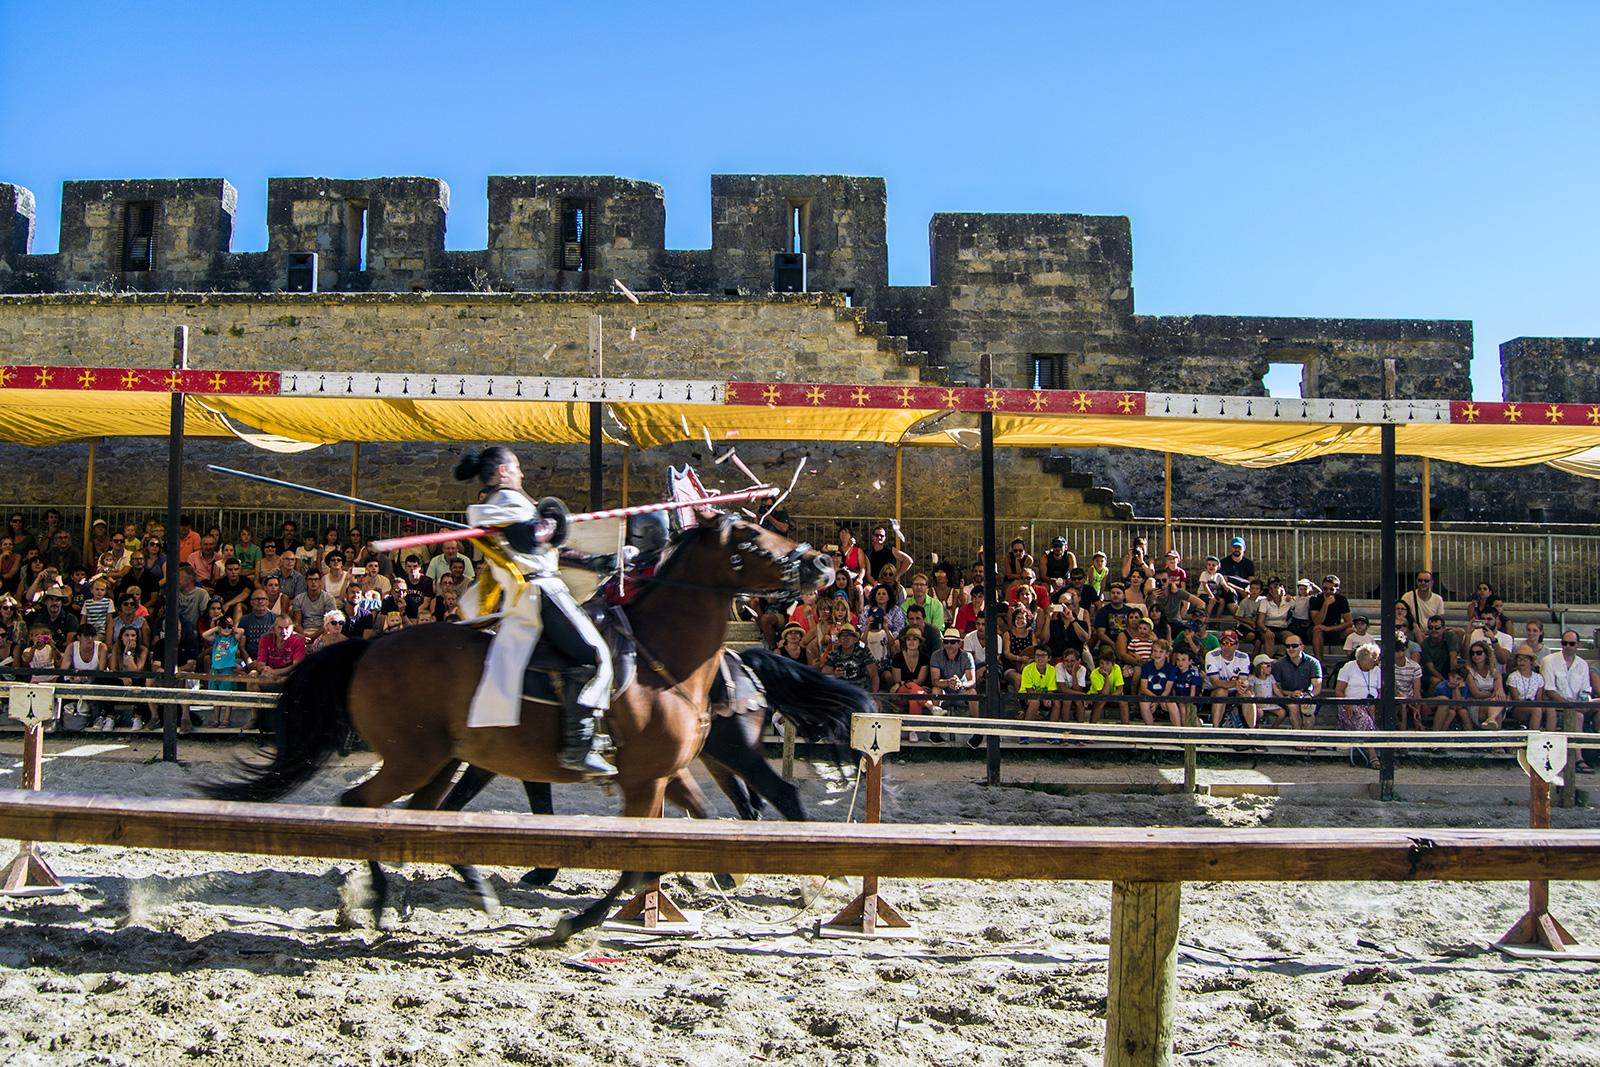 Espectáculo medieval en Carcassonne